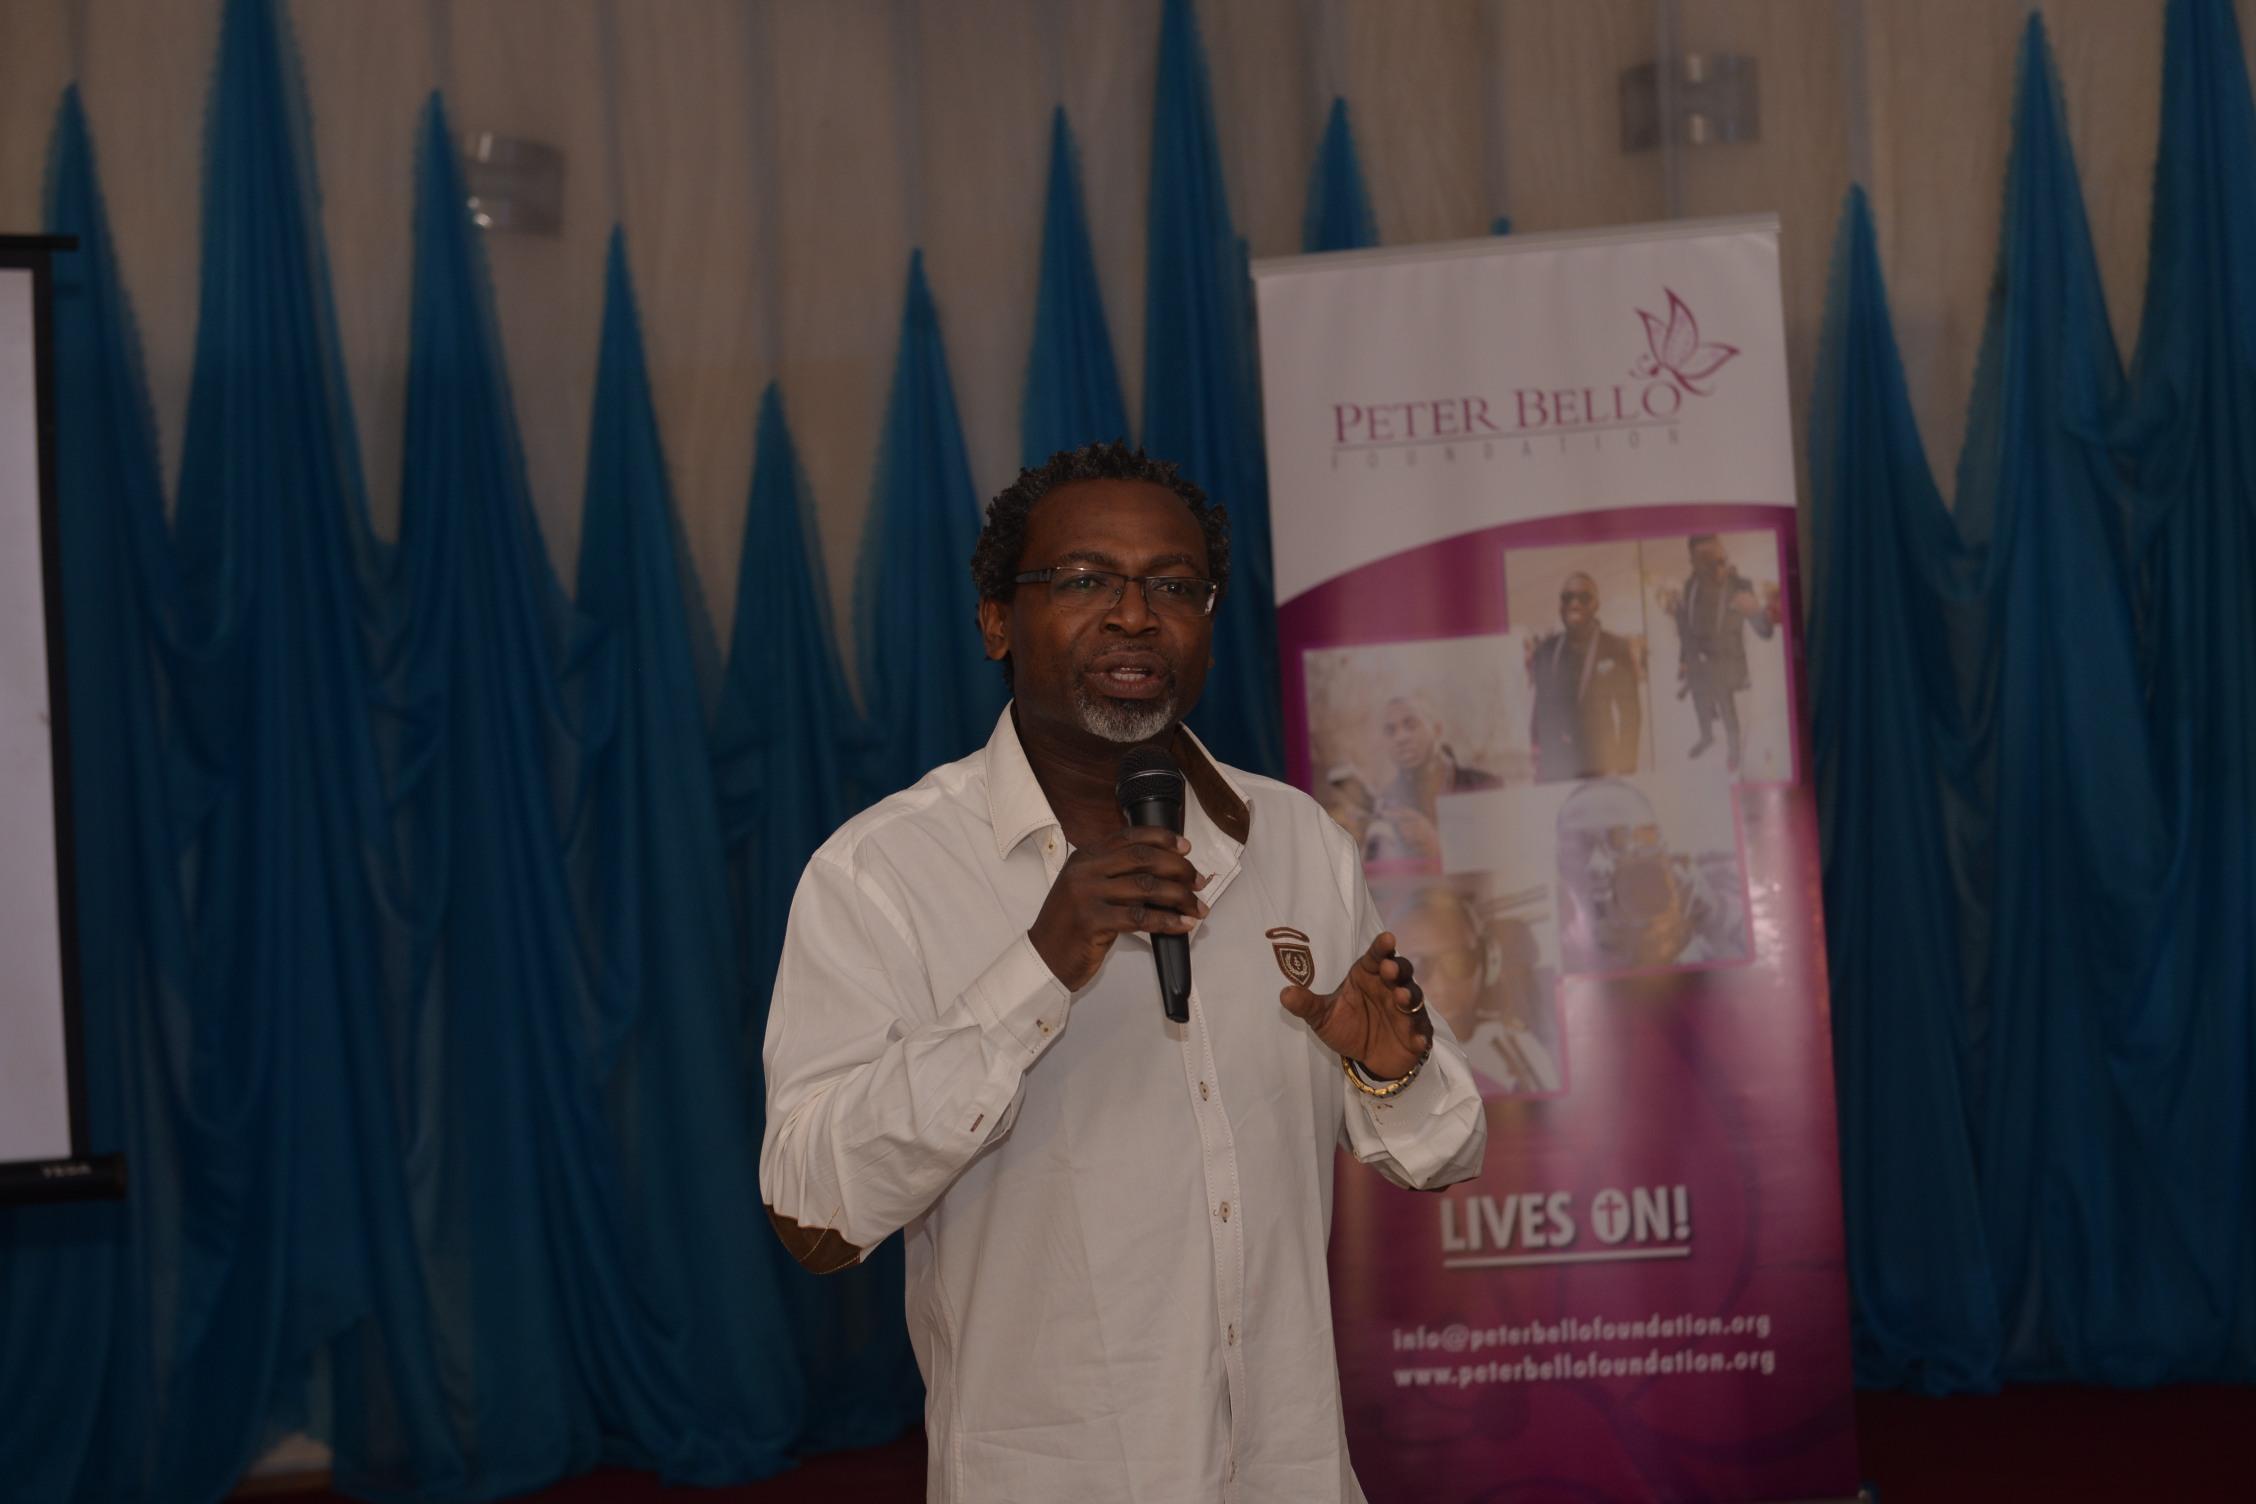 Kelechi Amadi Obi at the Photography Masterclass